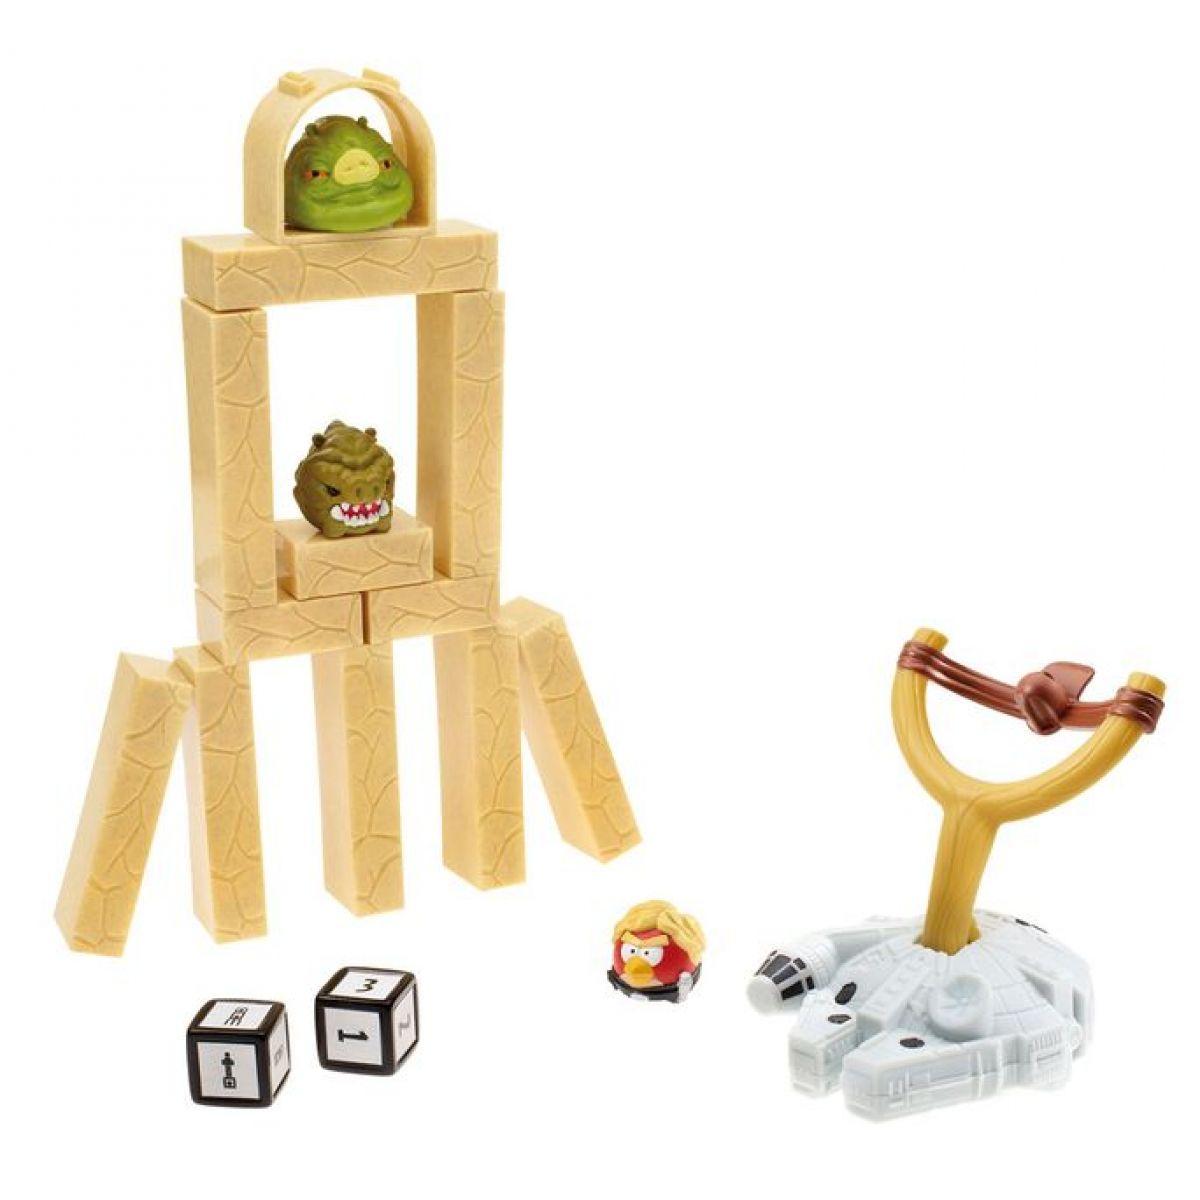 Hasbro Angry Birds Jenga - Tatooine